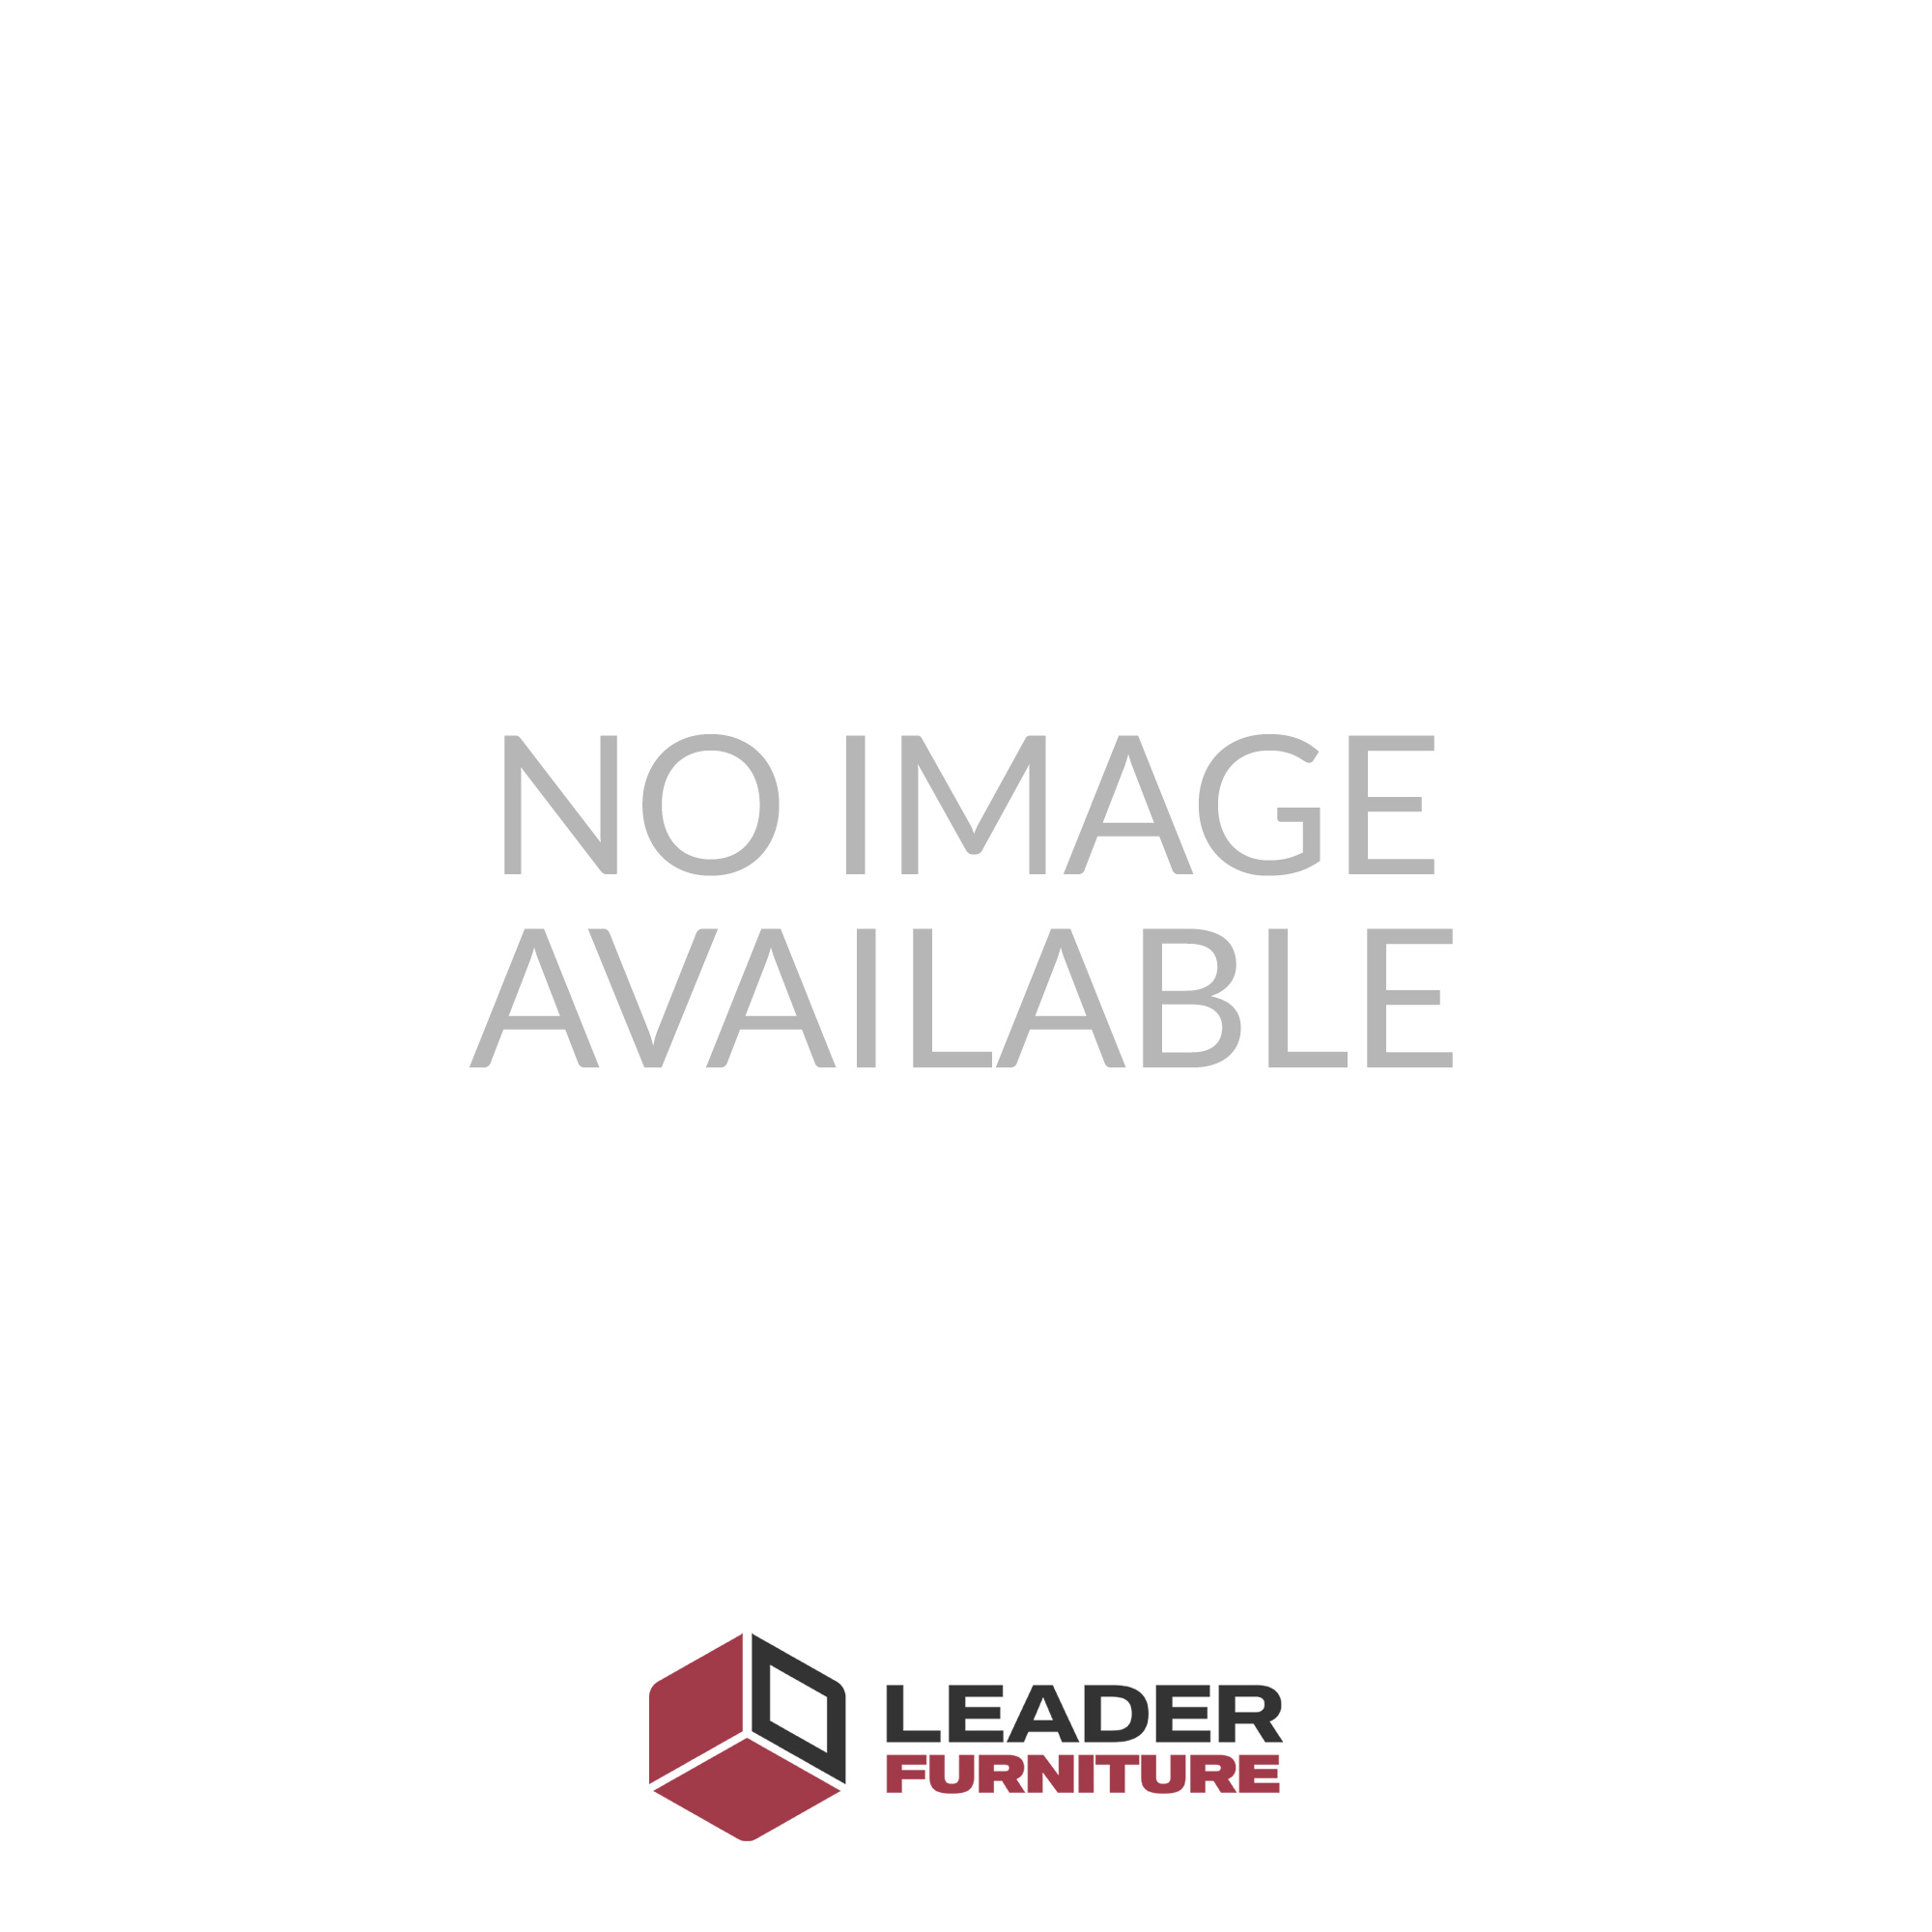 asda photo promotional code 2012 Xh